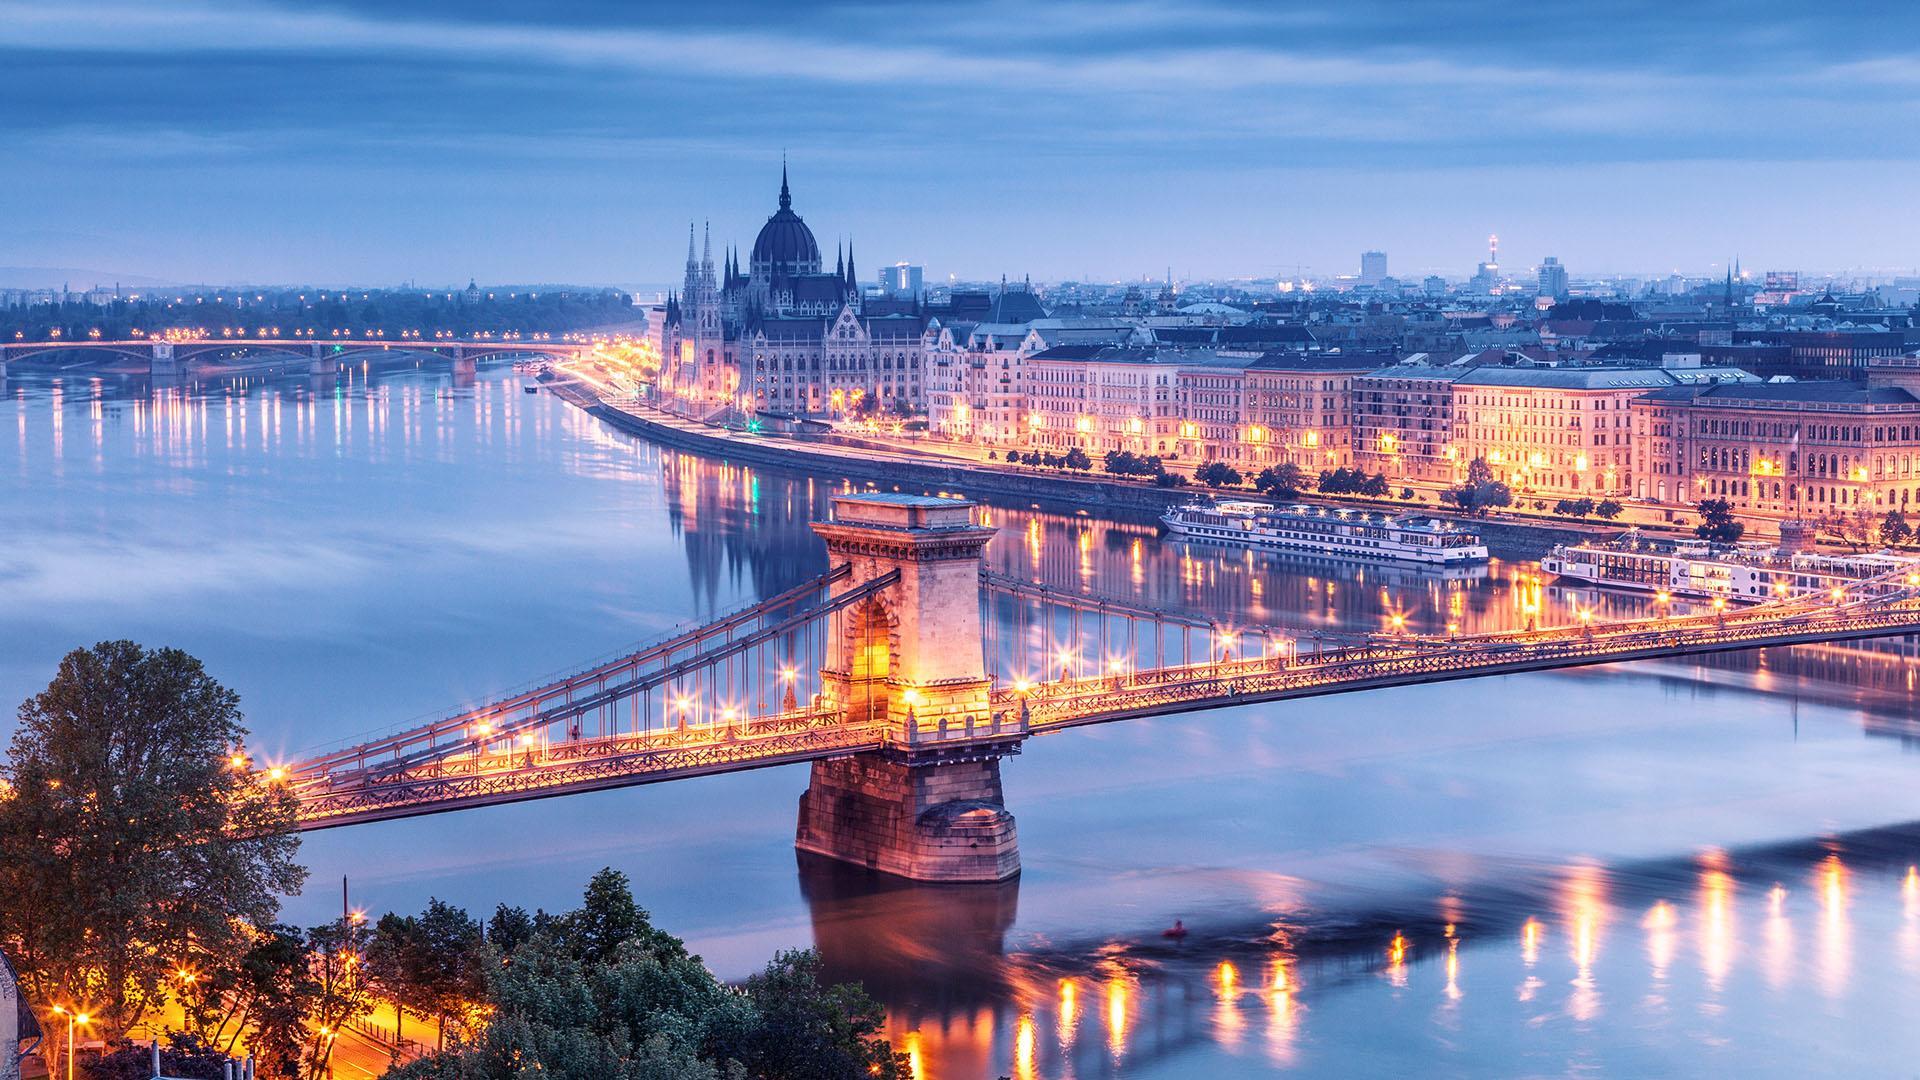 5104226627001 5515999951001 5214933106001 vs - جاهای دیدنی بوداپست ، مجارستان | Budapest